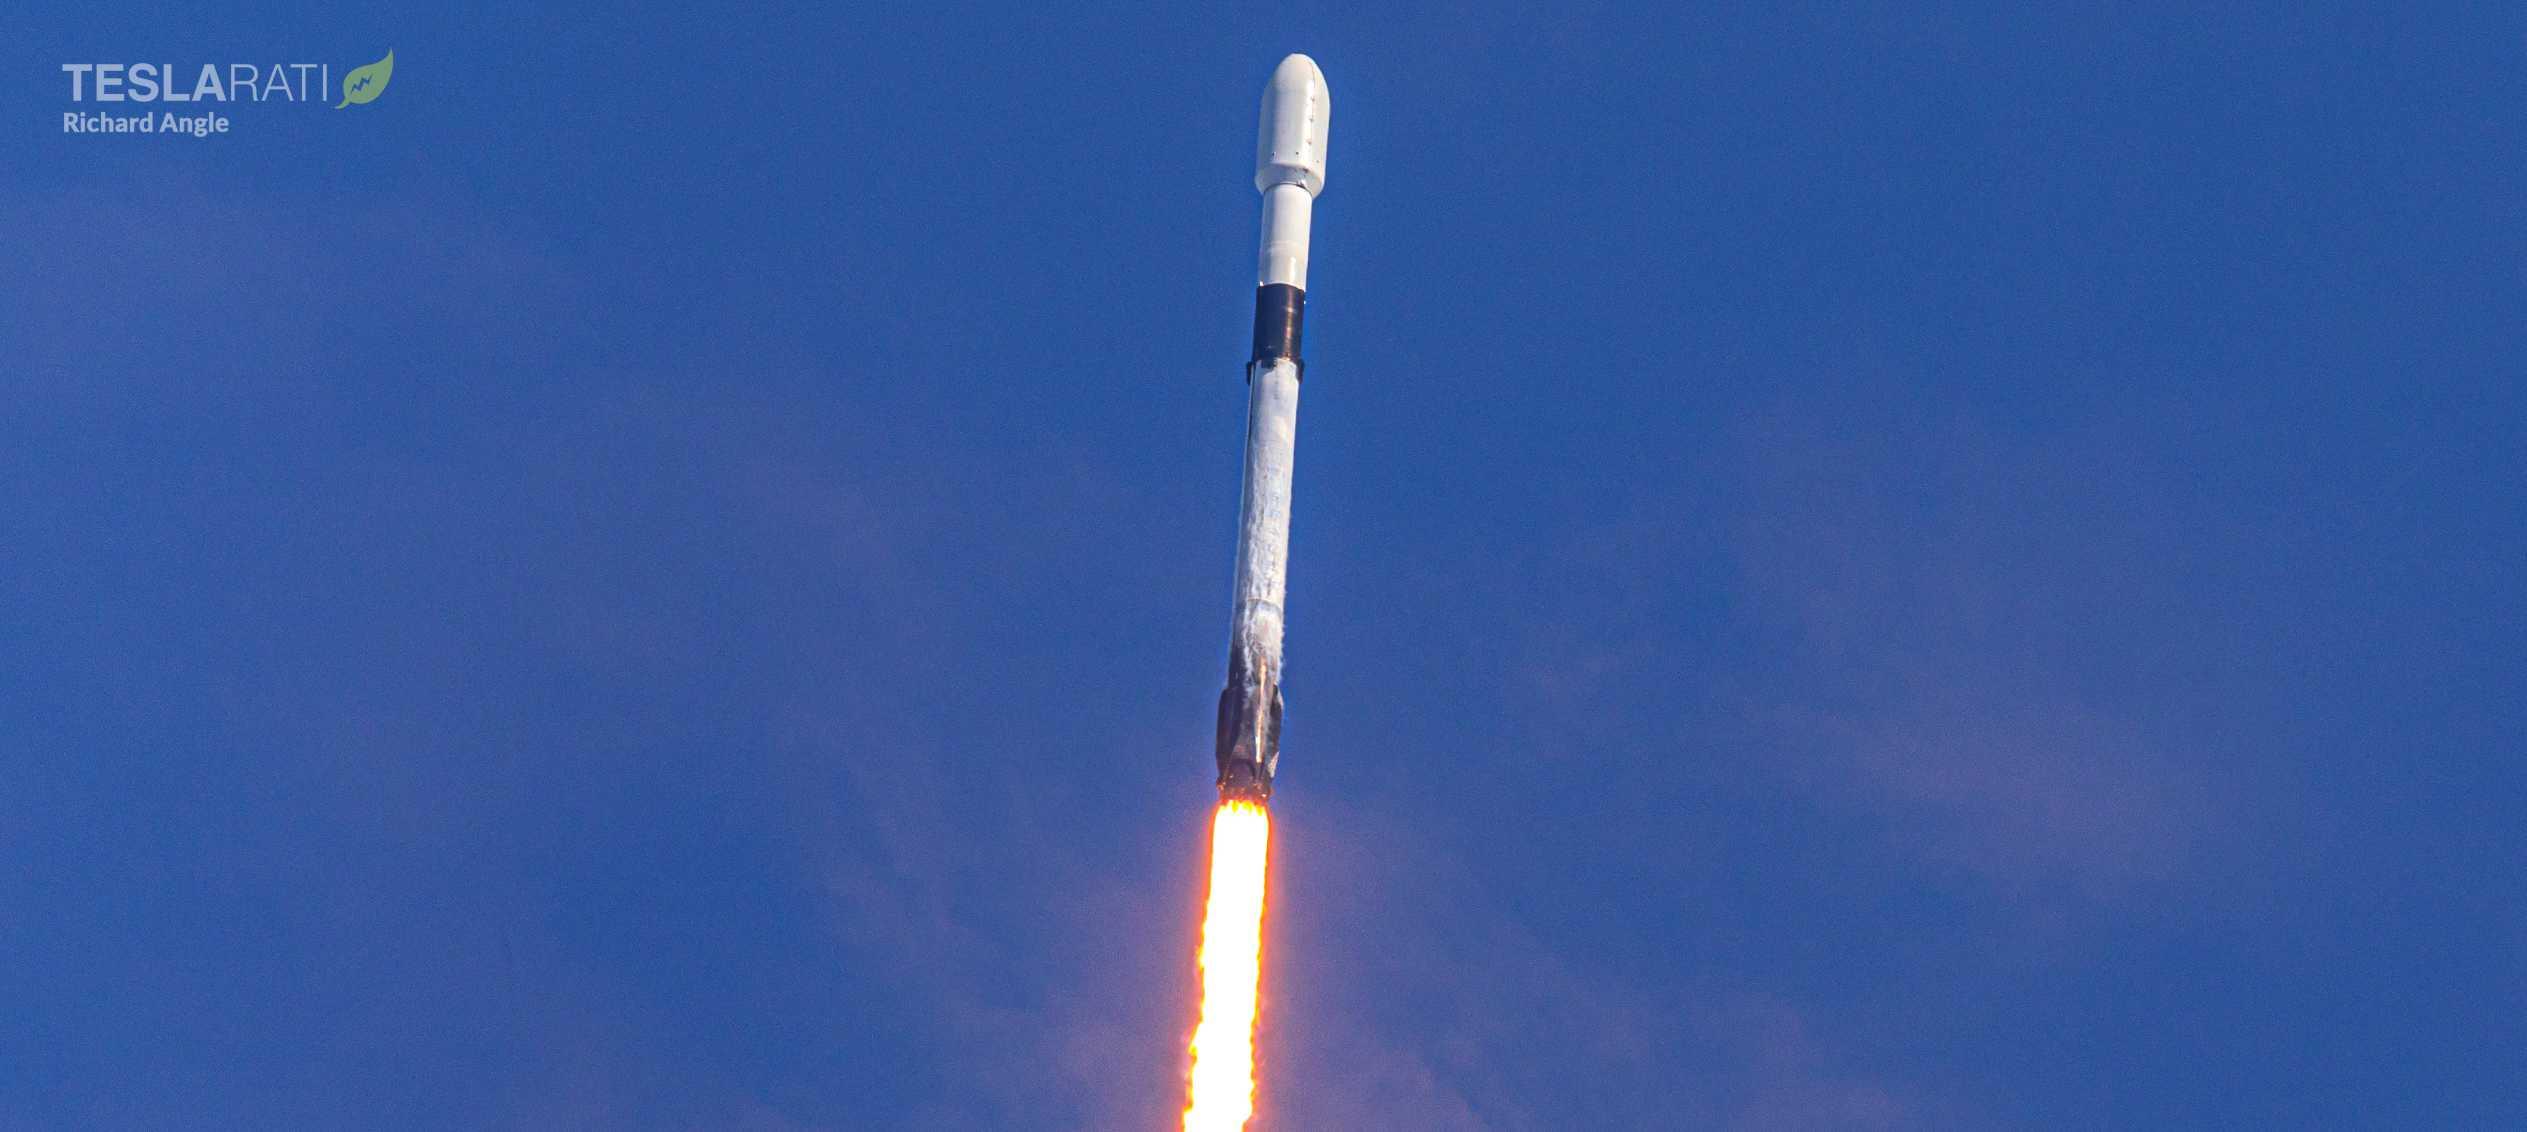 Starlink V1 L4 F9 B1056 021720 (Richard Angle) launch (1) crop (c)